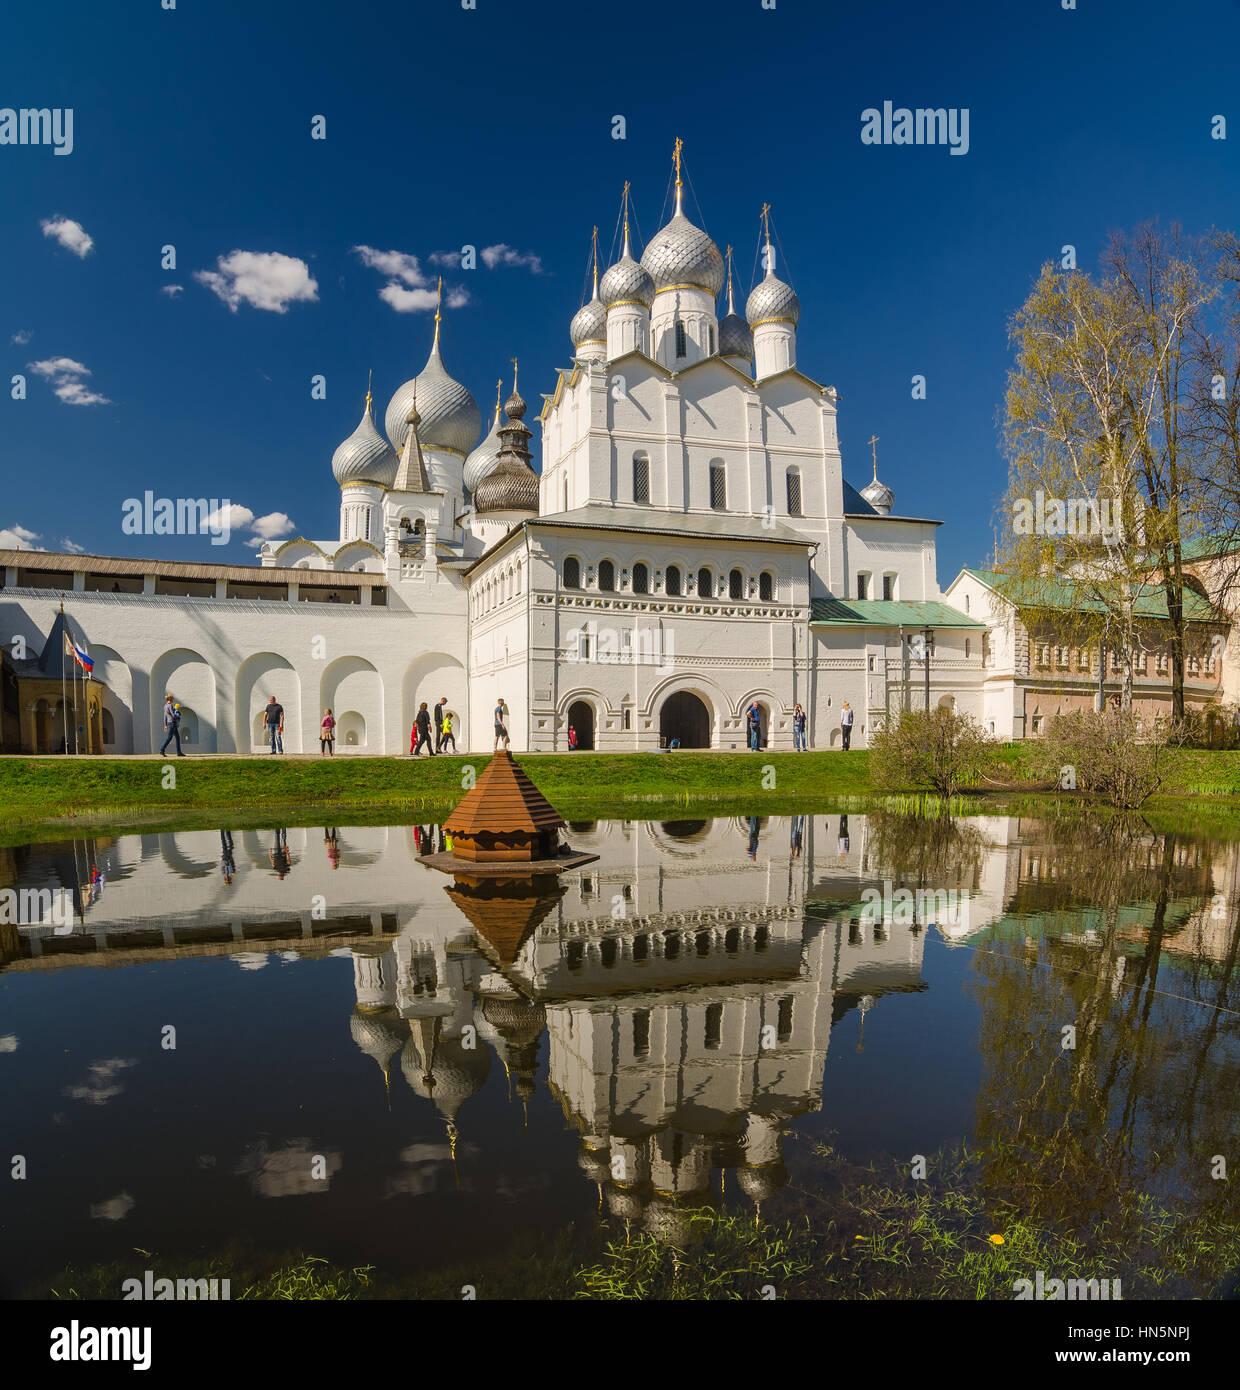 Rostov Kremlin: description, history. State Museum-Reserve Rostov Kremlin 72